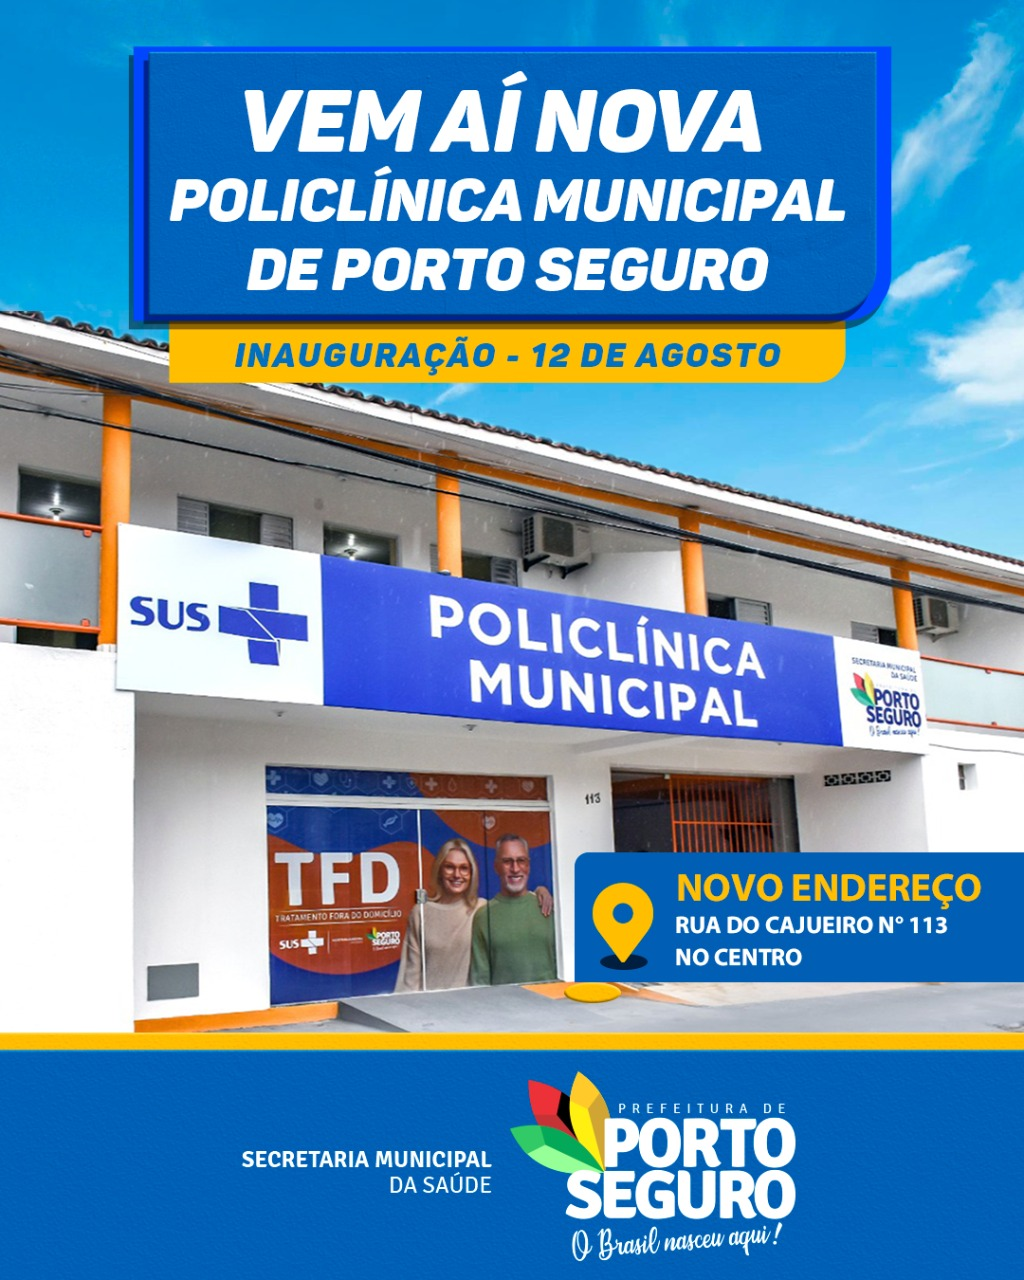 Nova Policlínica Municipal de Porto Seguro 23